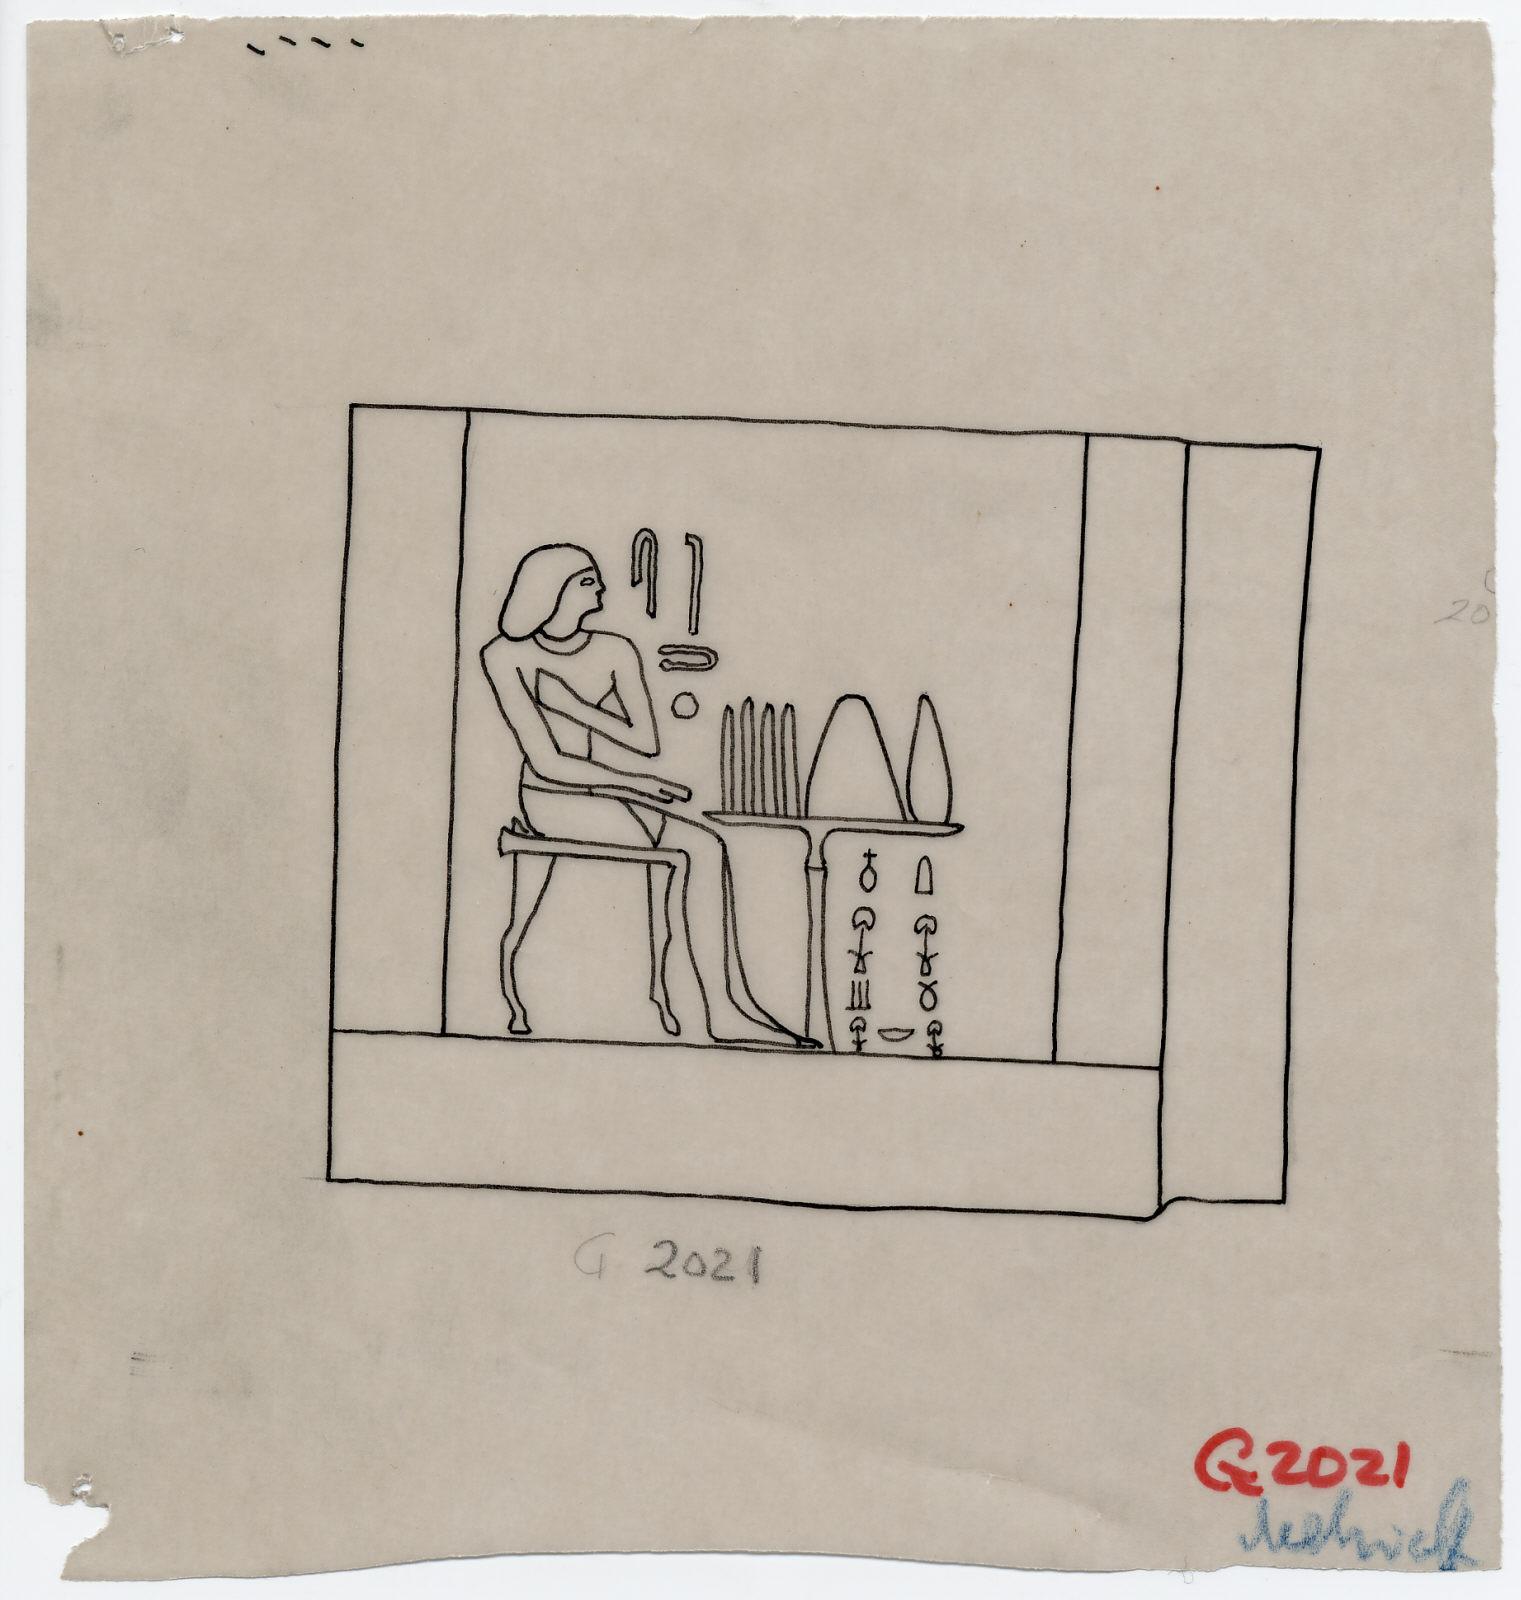 Drawings: G 2021c: false door tablet